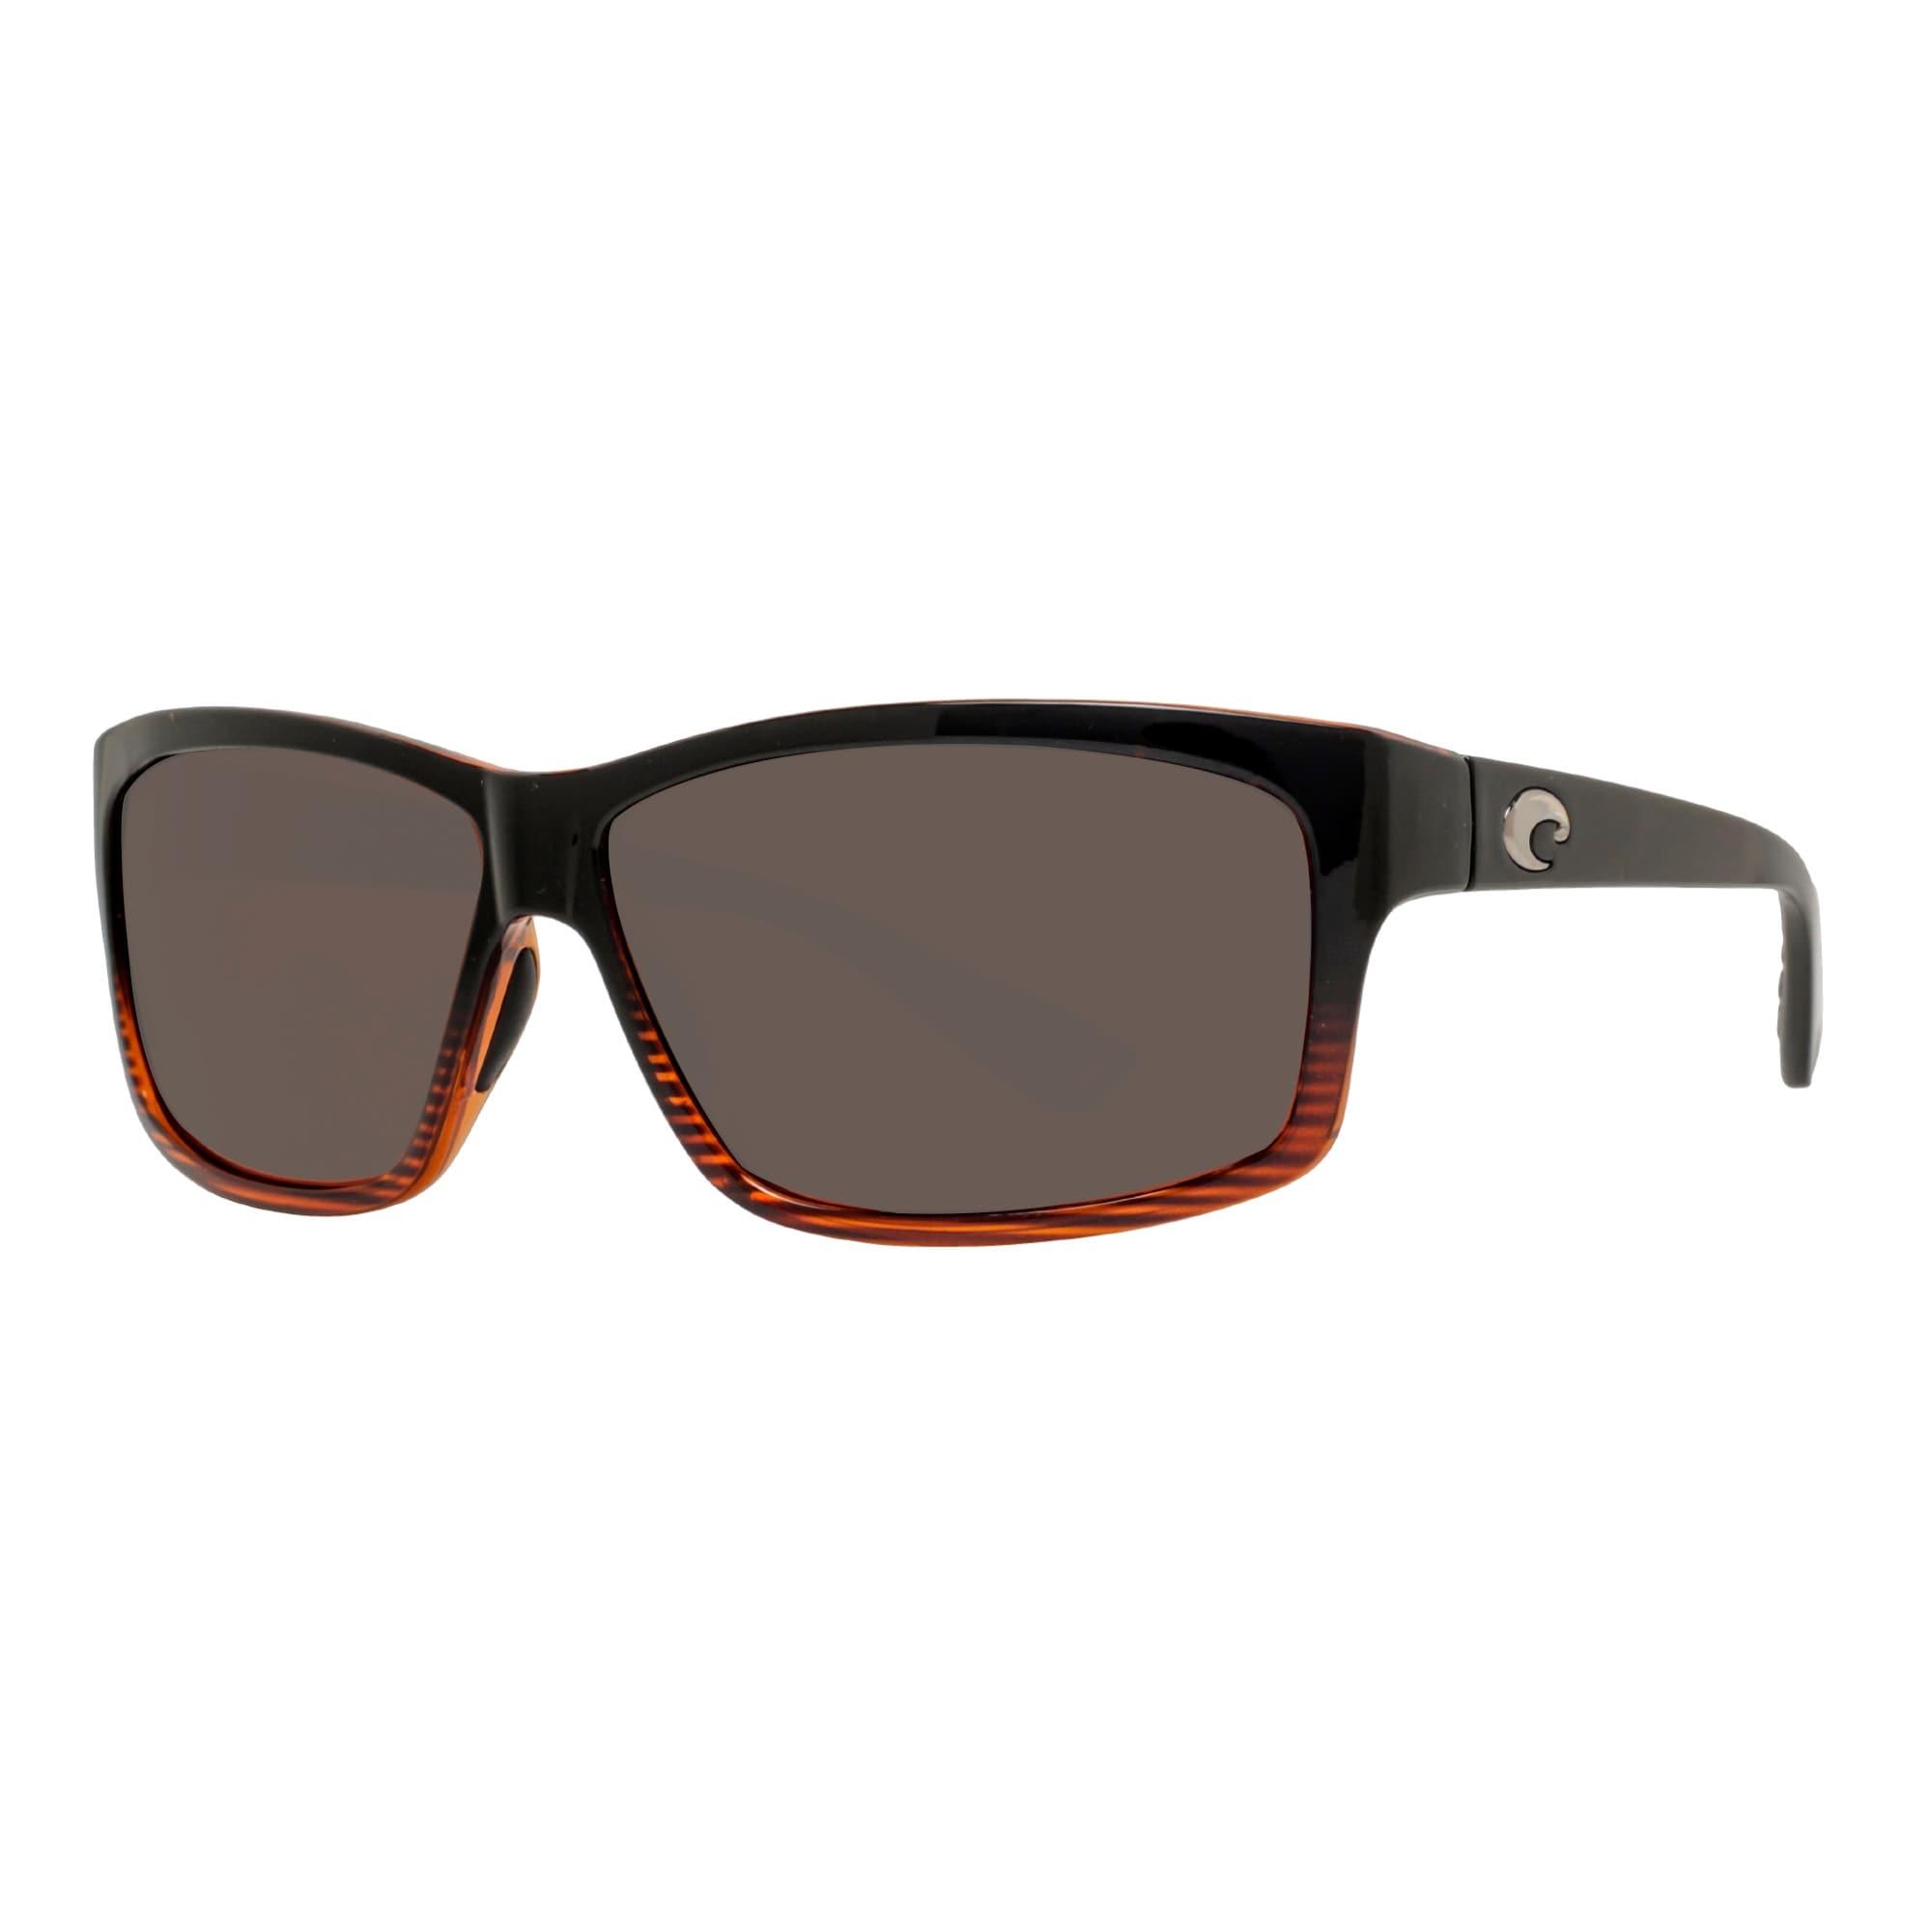 f792d31806cb Costa Del Mar Cut UT52OGP Coconut Fade Black 580P Gray Polarized Sunglasses  - coconut fade black brown - 59mm-18mm-120mm